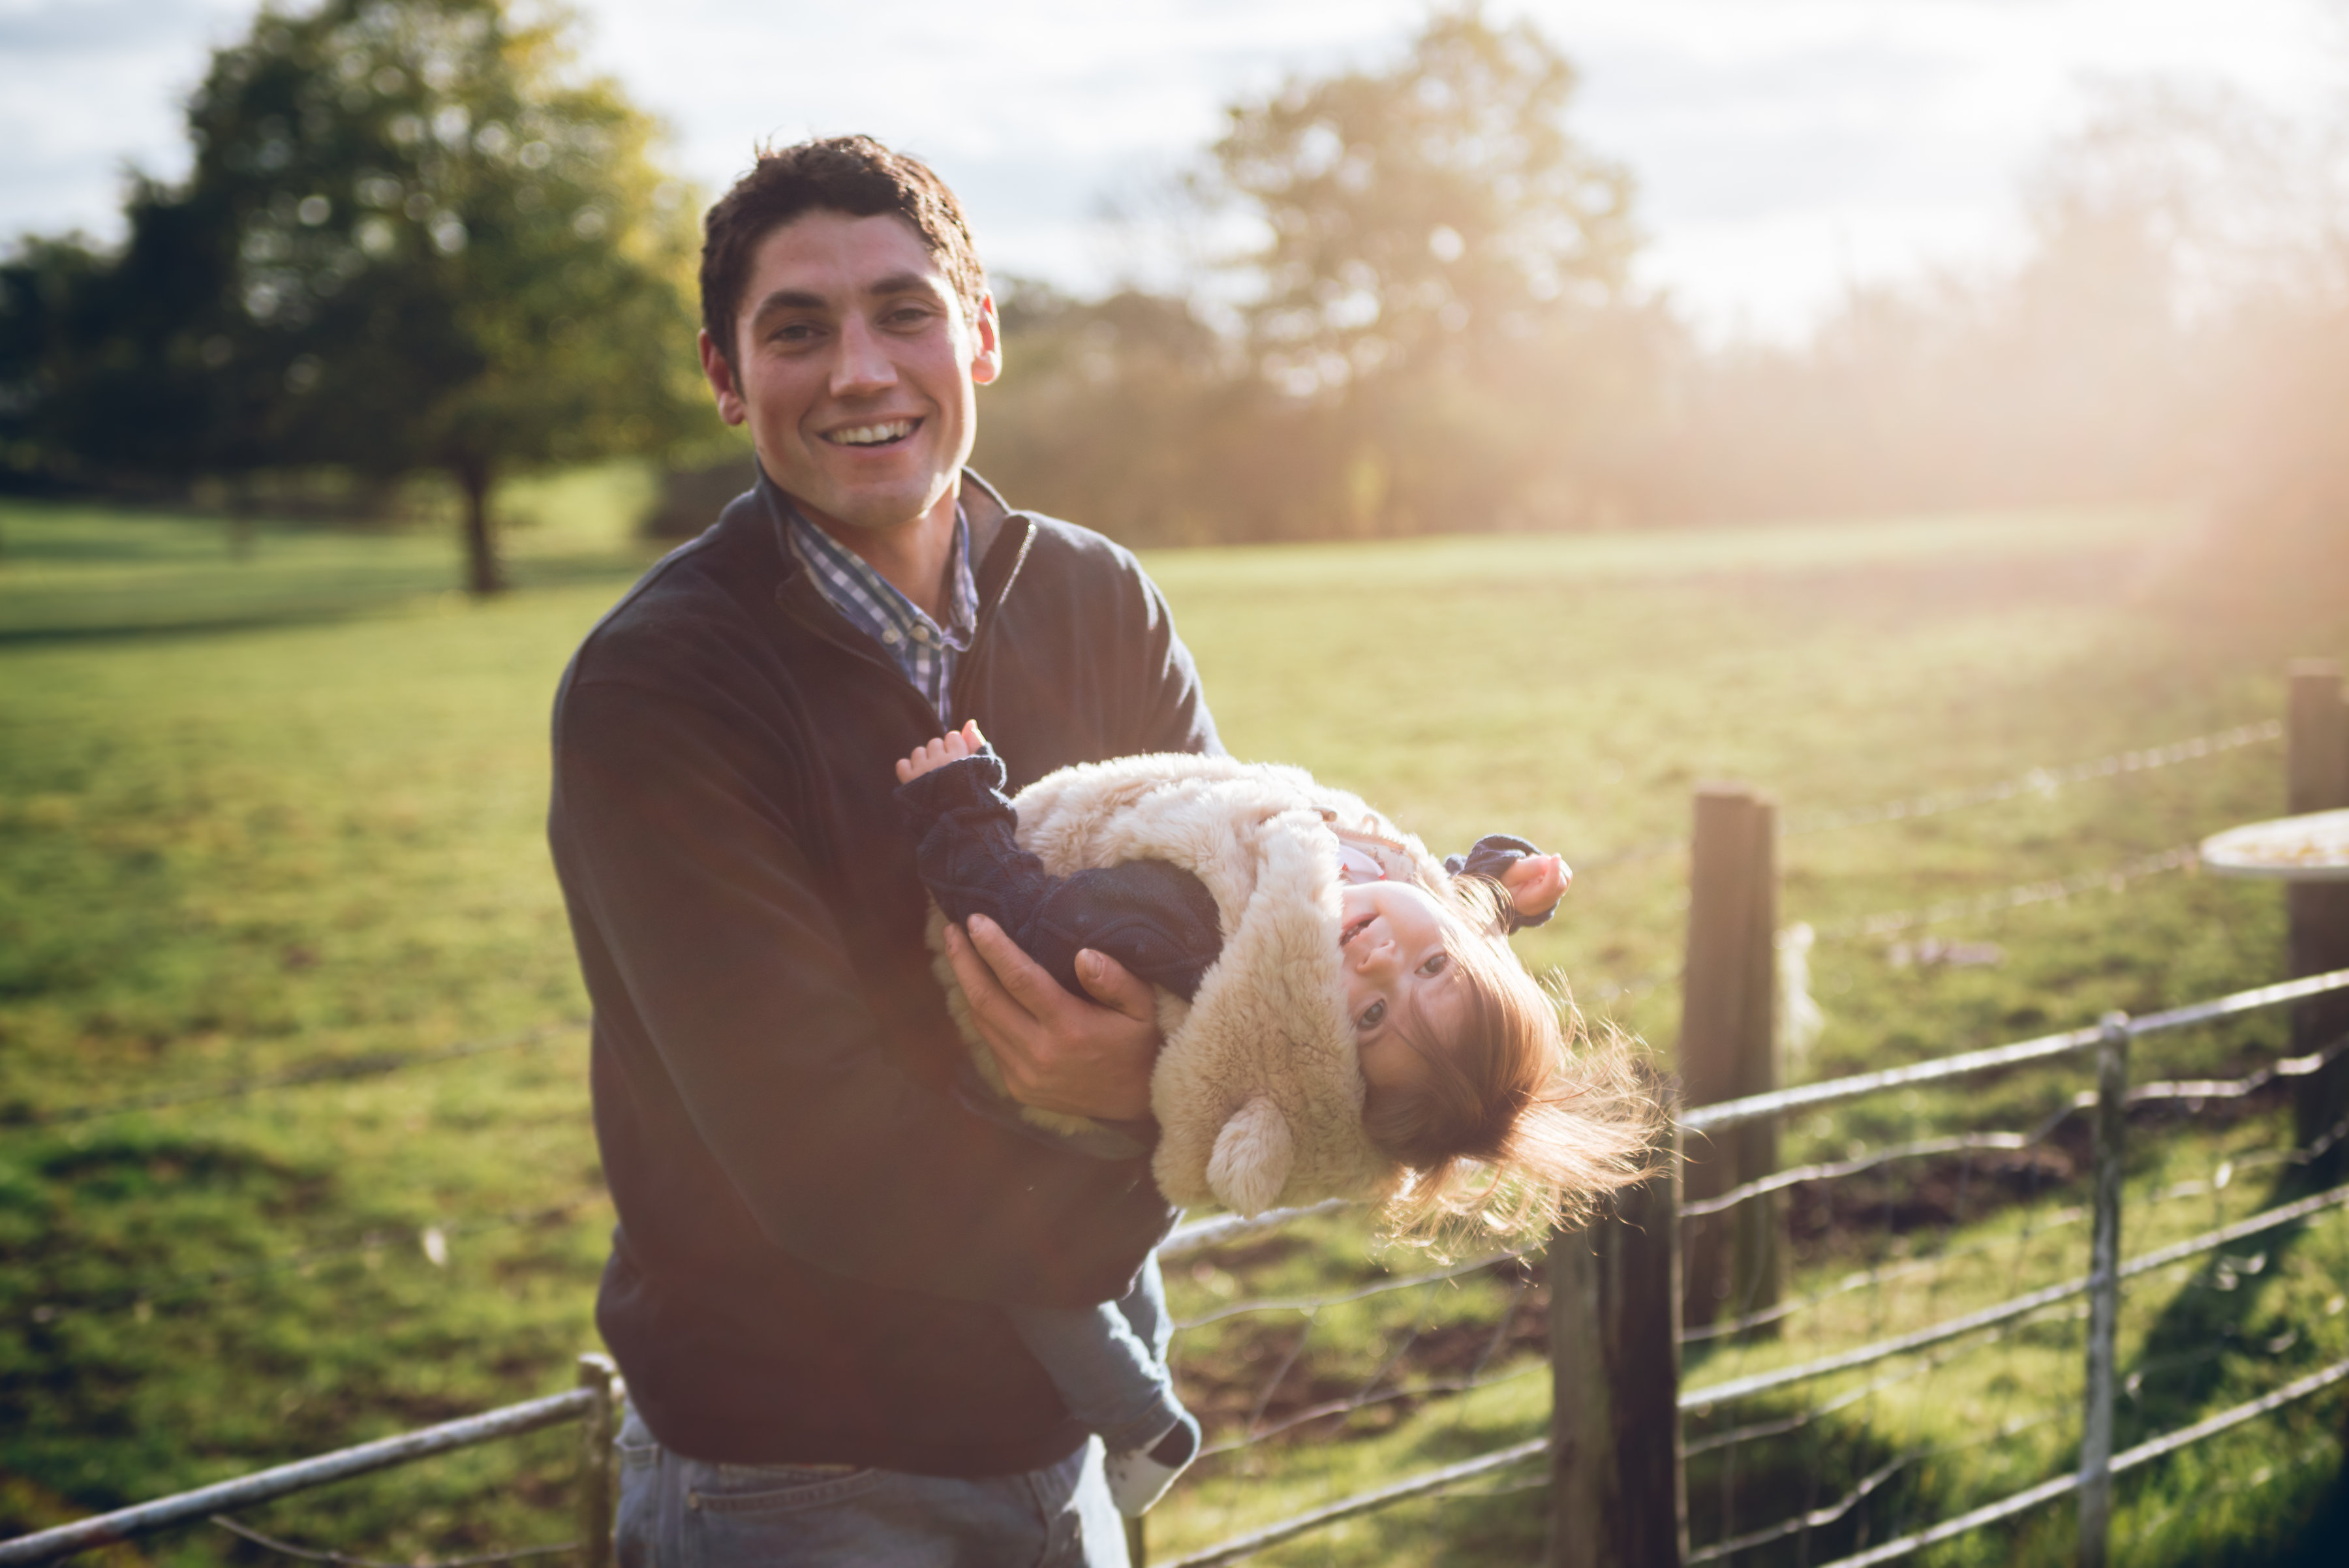 Family Photoshoot Leamington Spa